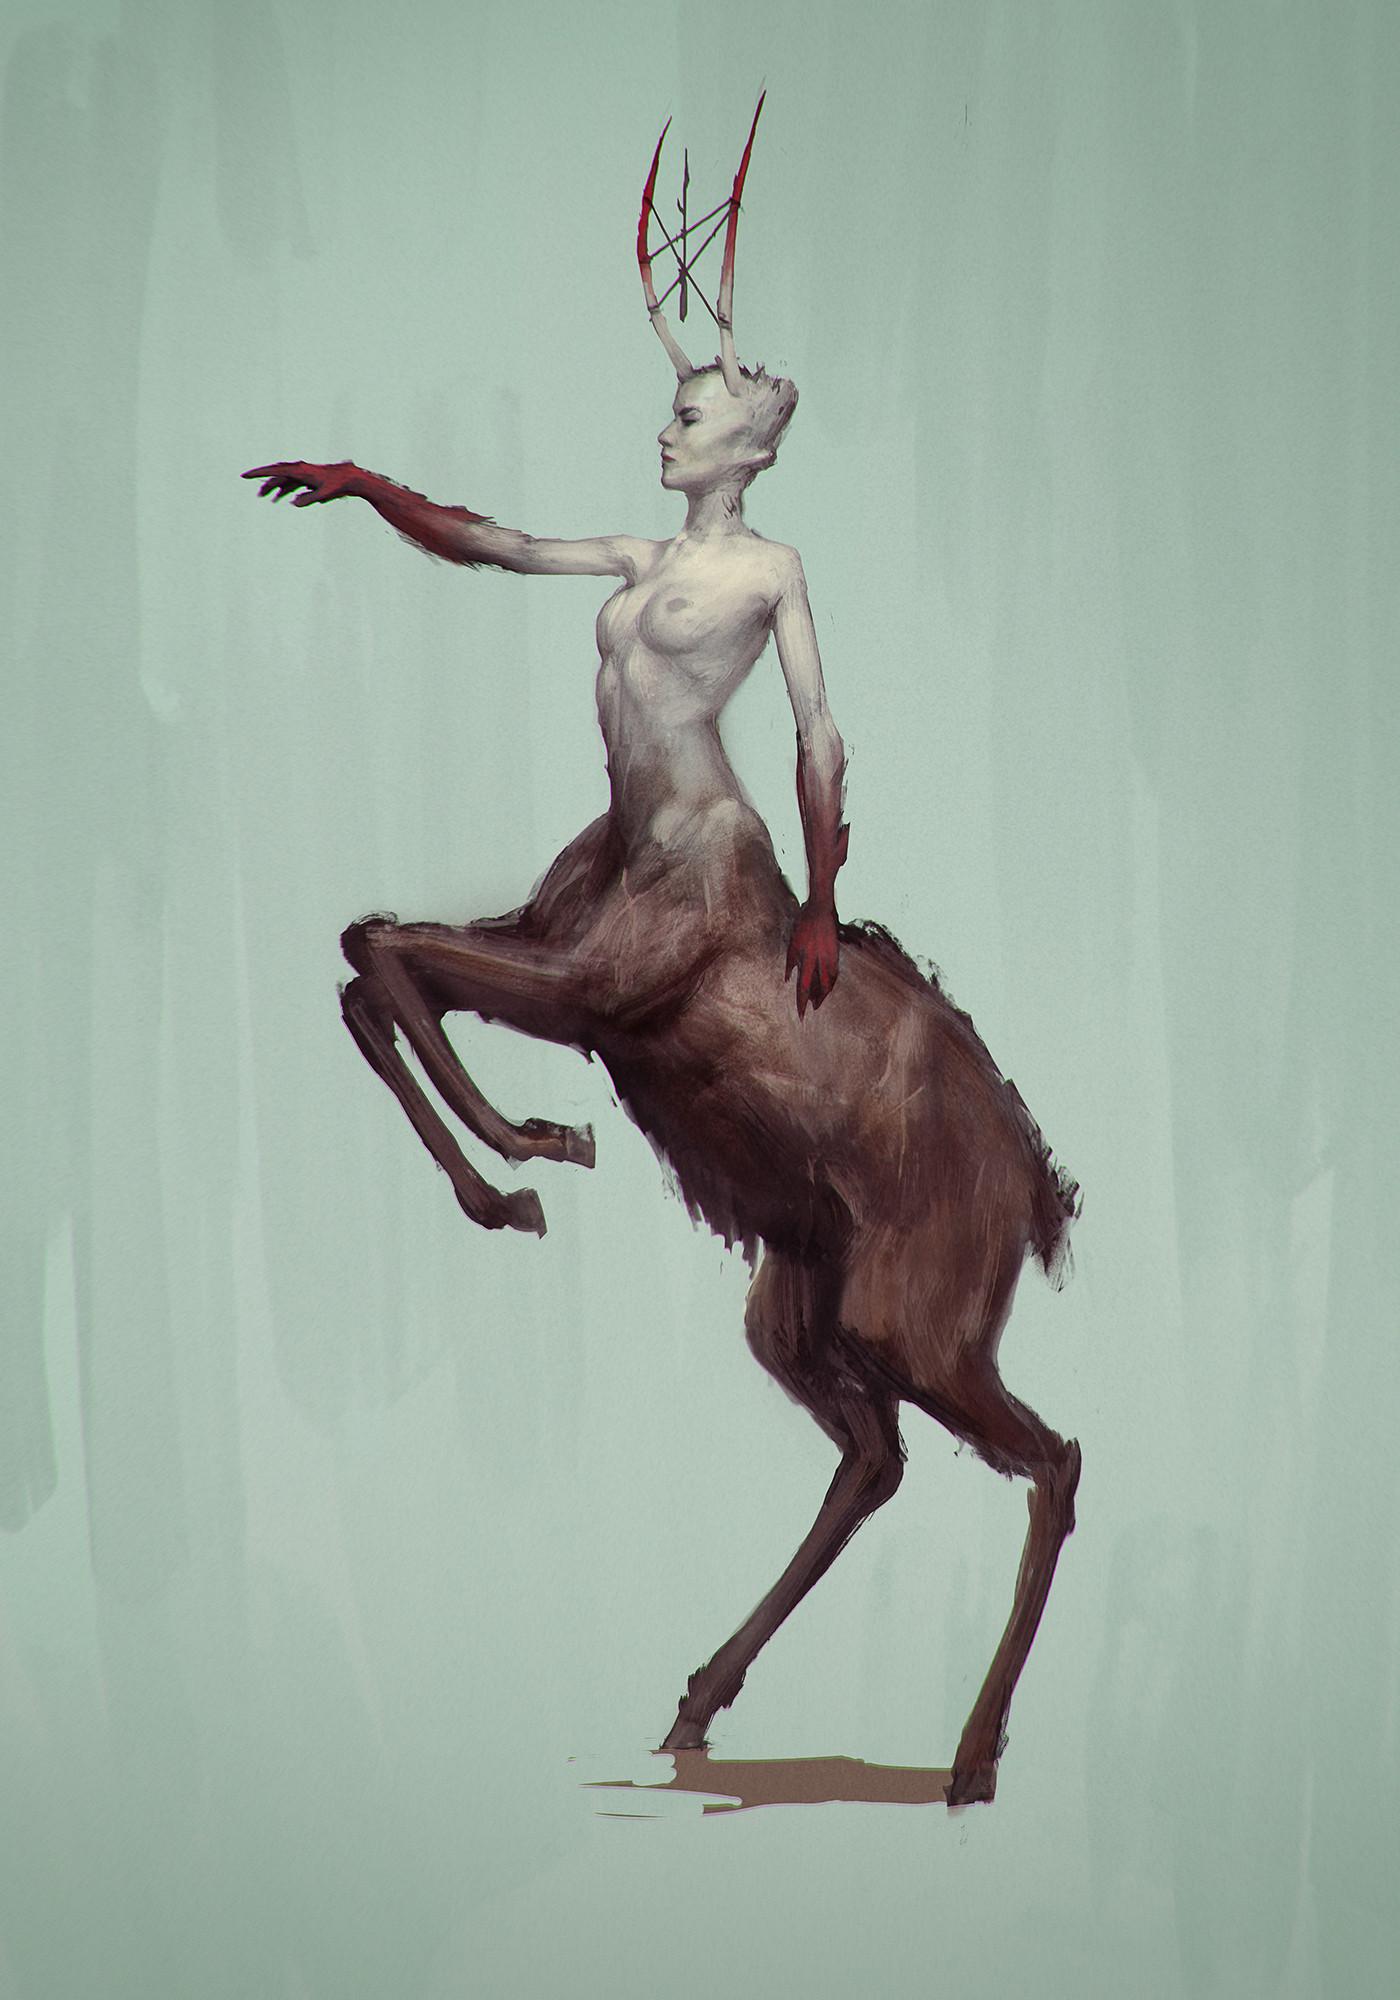 Bram sels centaur bram sels